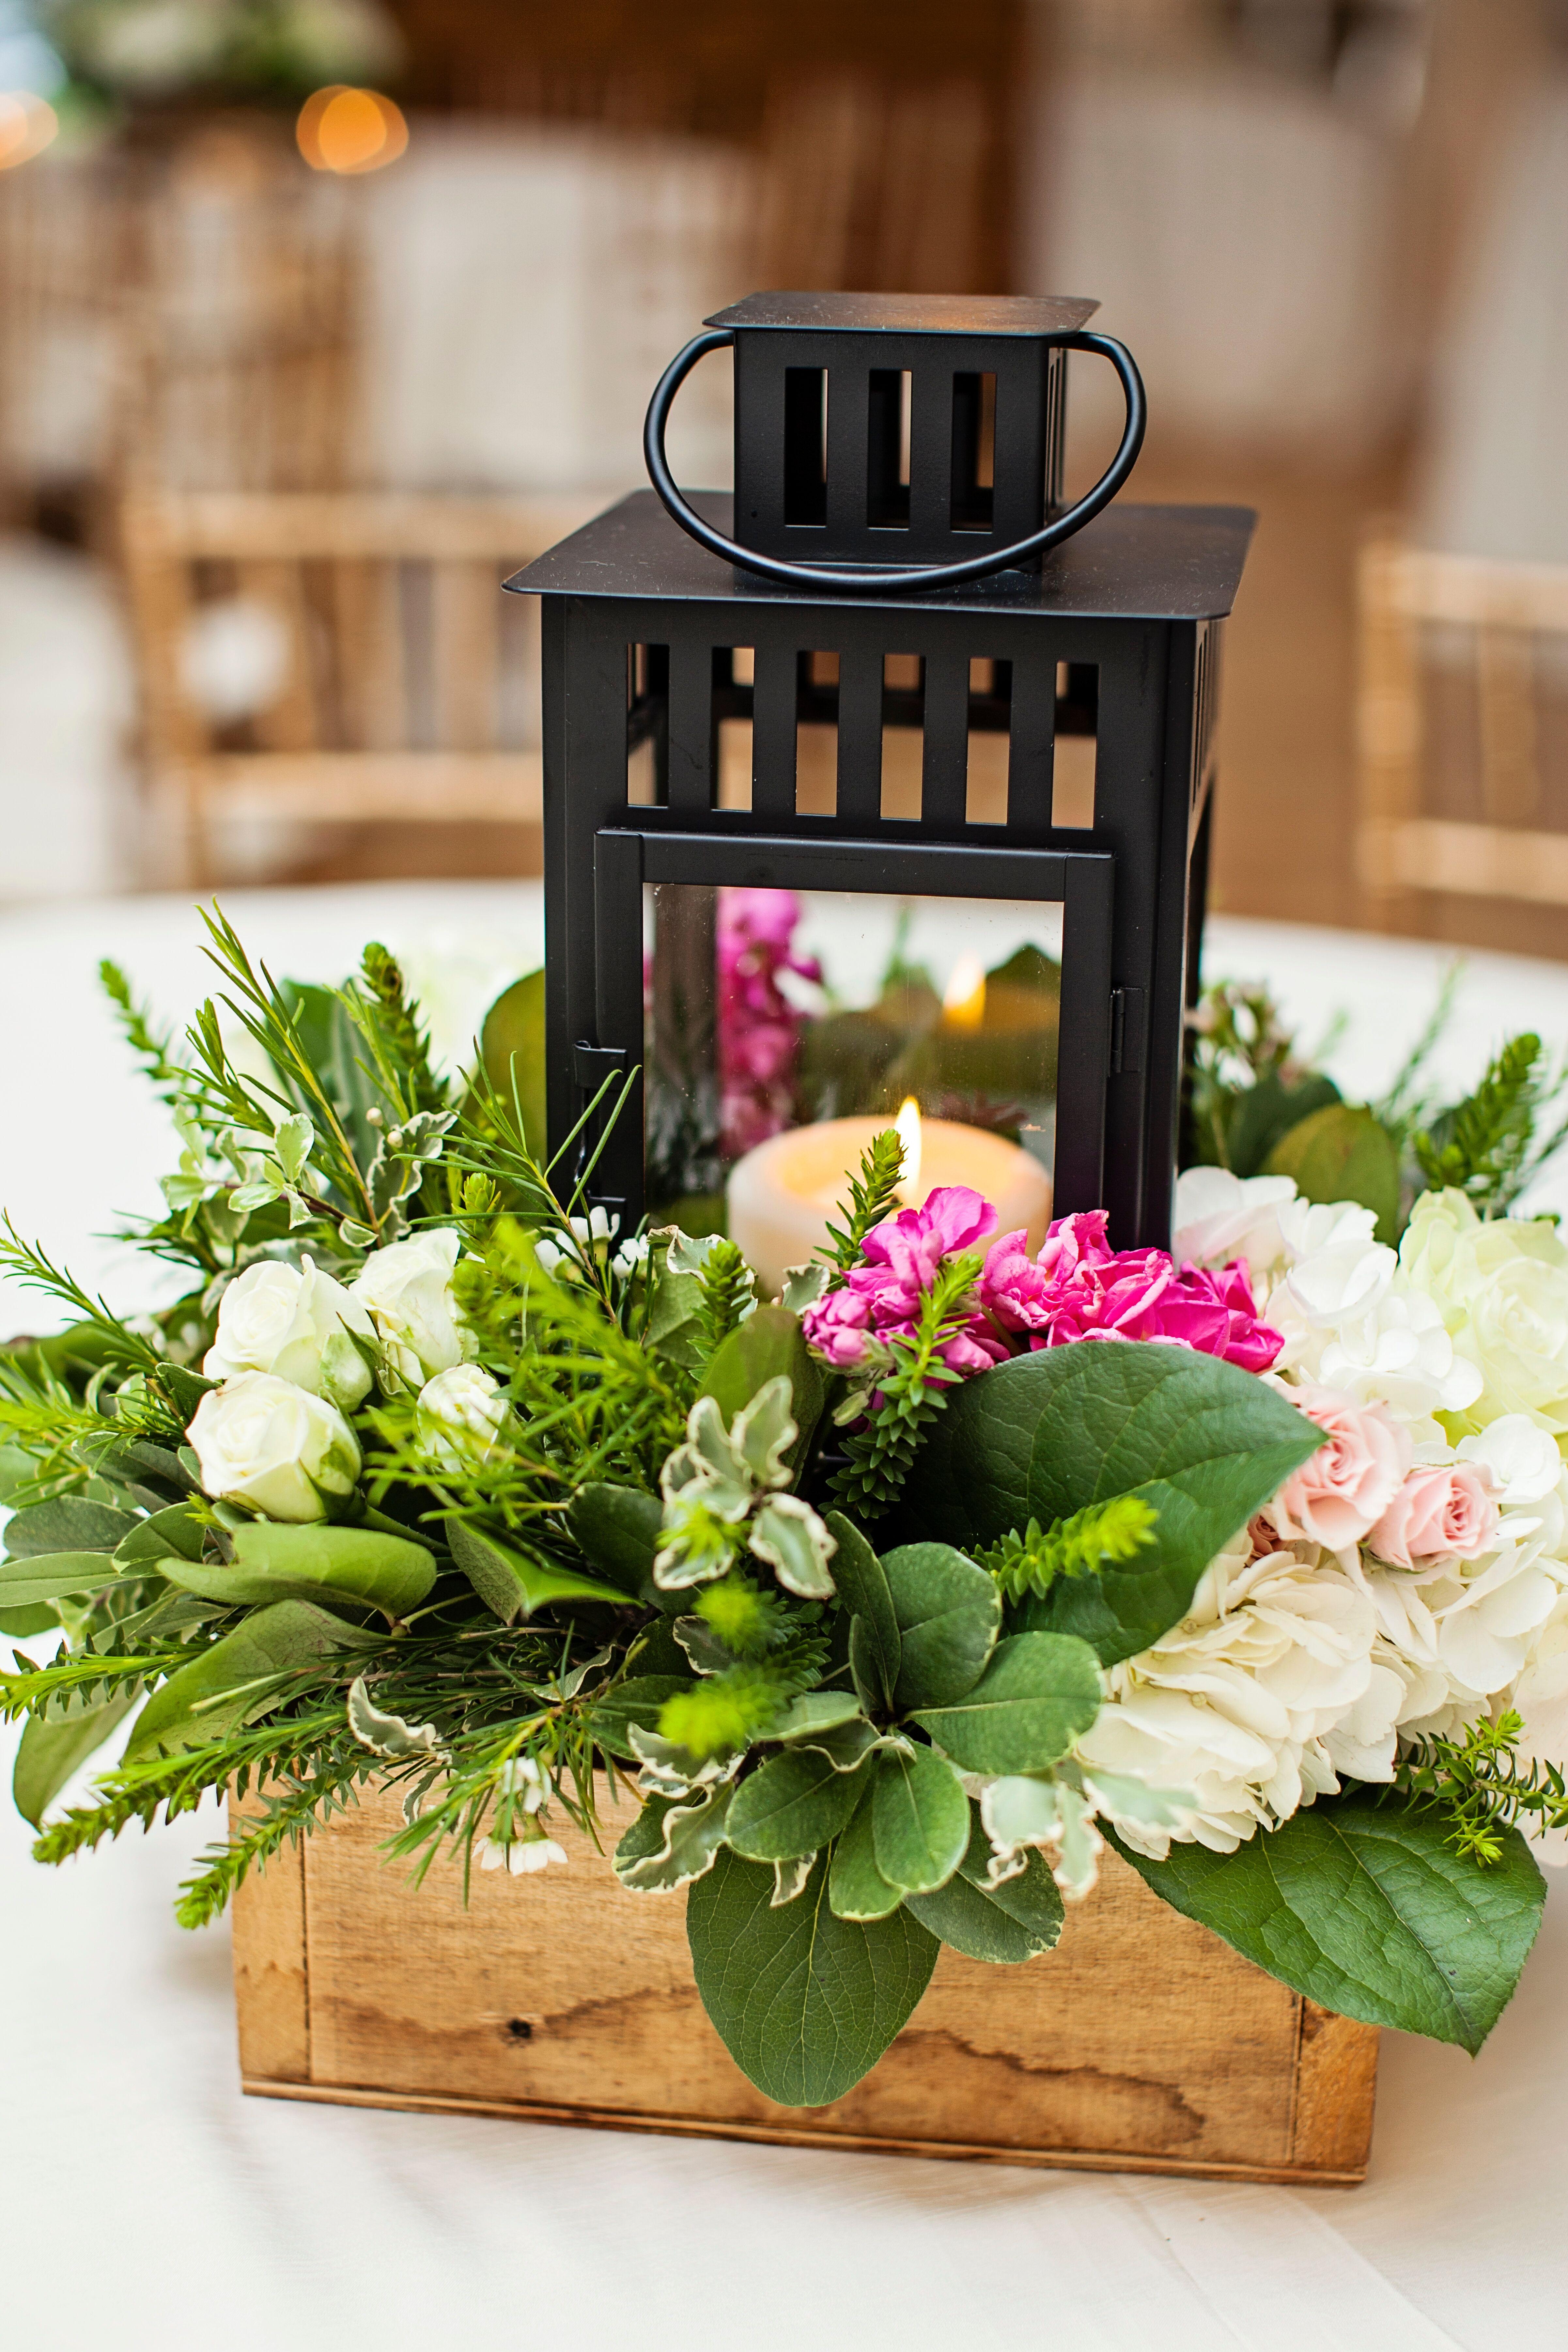 Black lantern centerpiece with fresh greenery